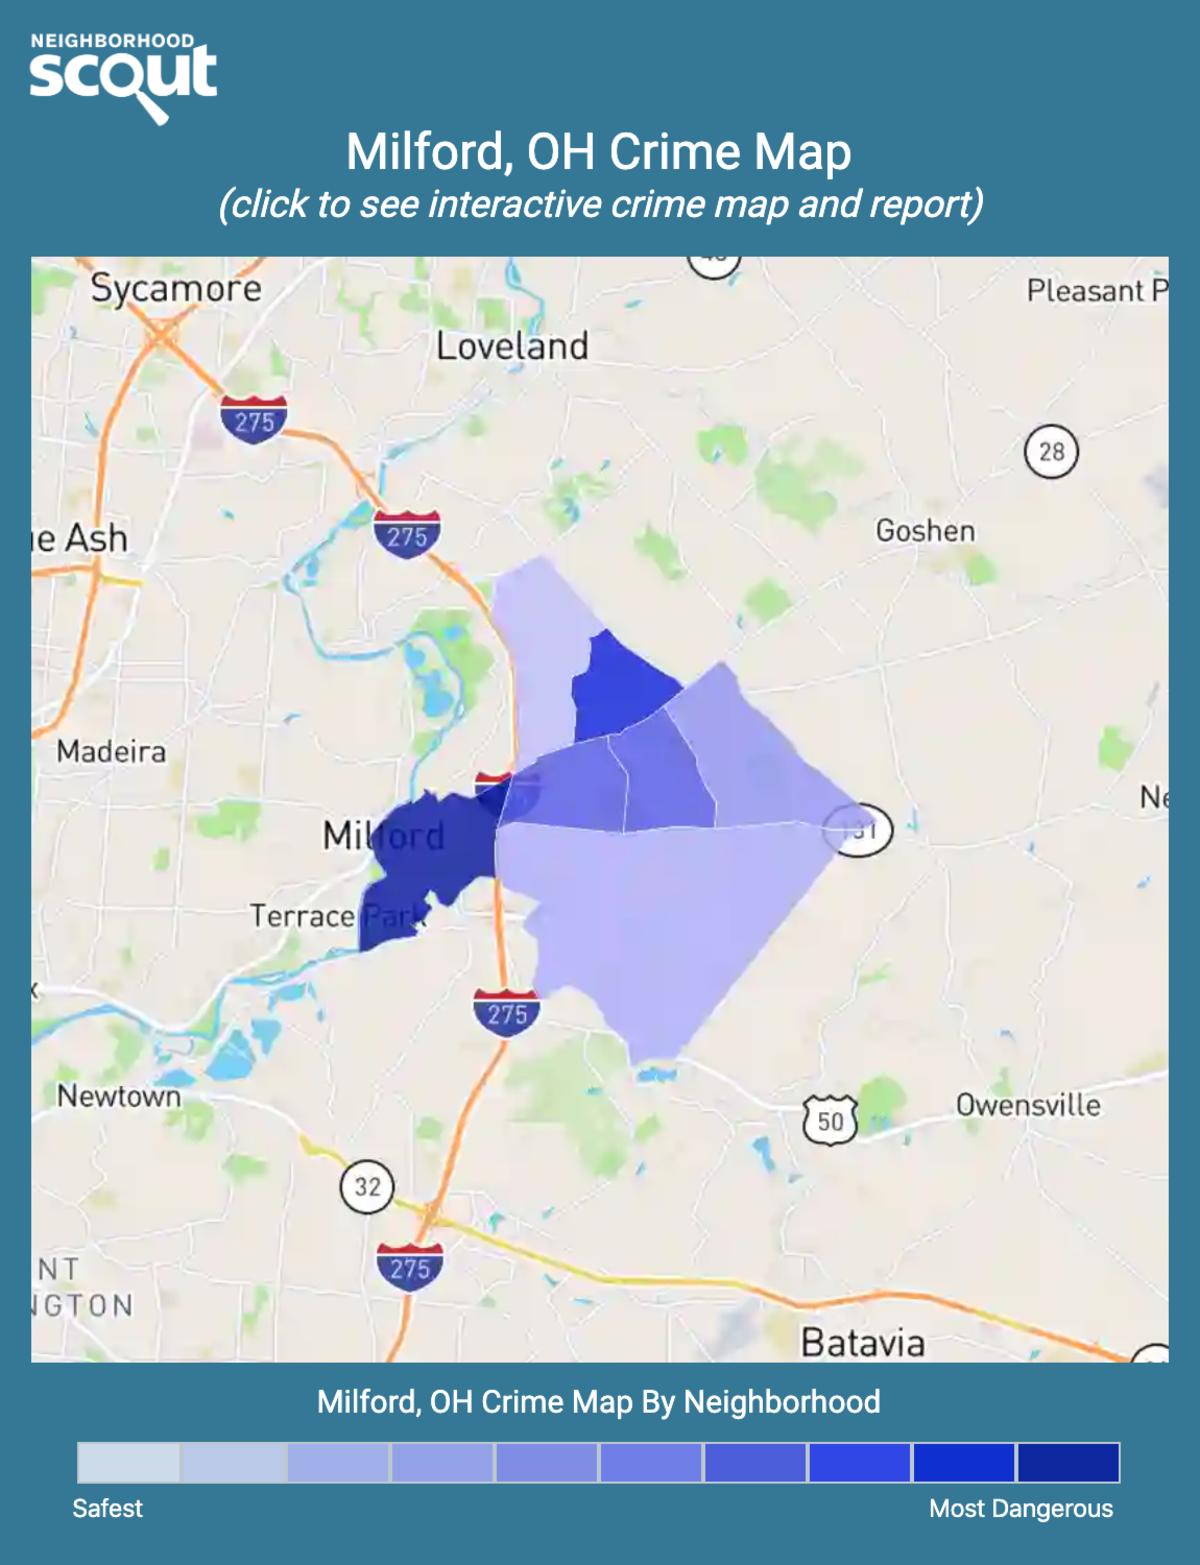 Milford, Ohio crime map